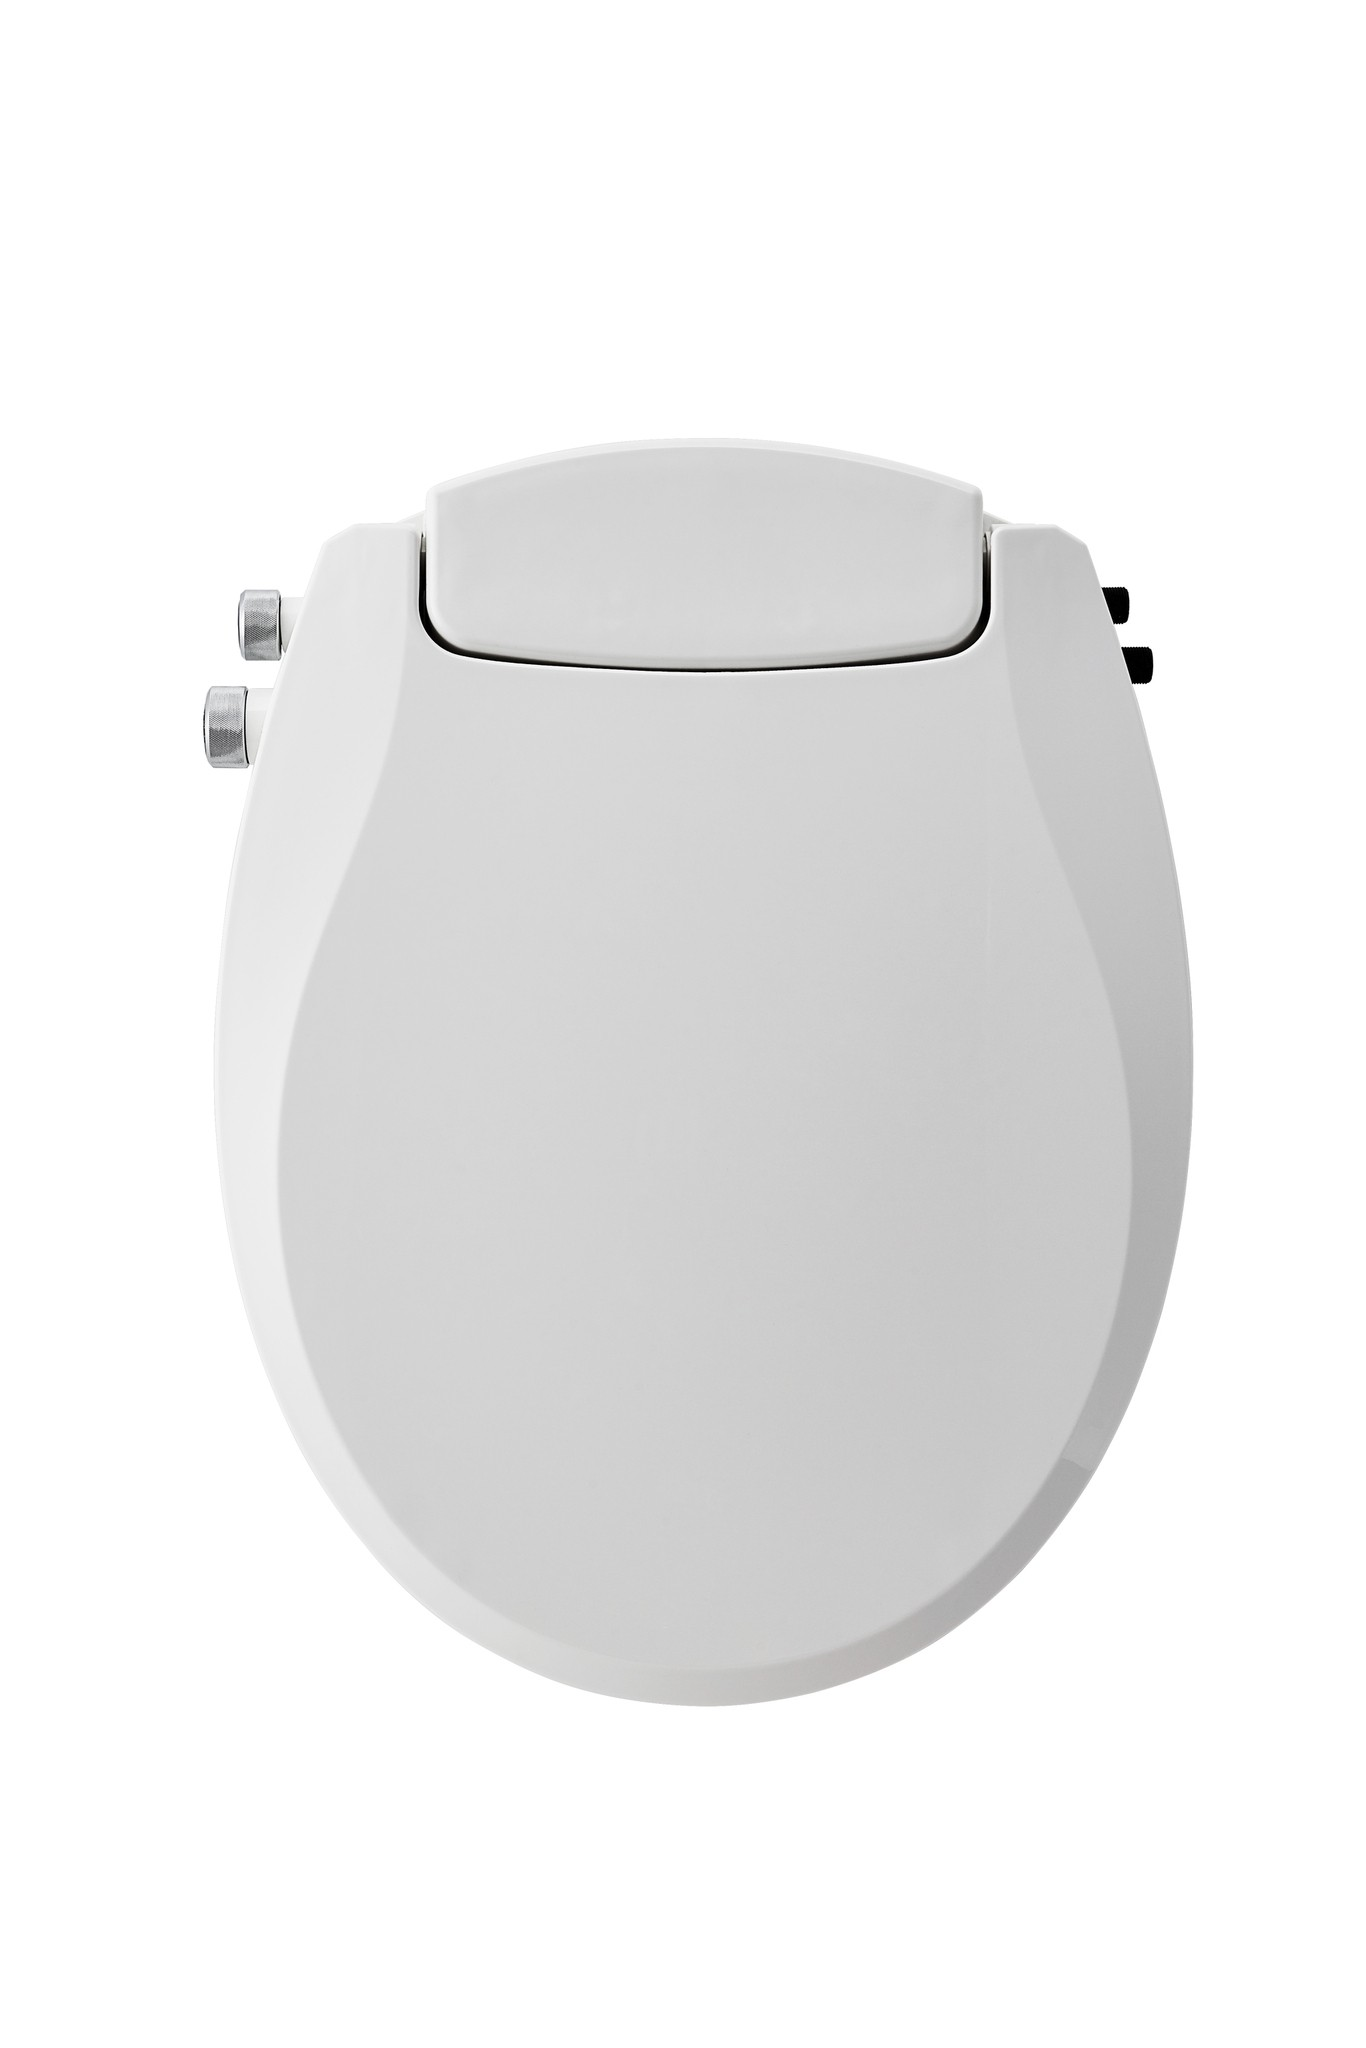 Maro D Italia Fp208 Hot Cold Non Electric Bidet Toilet Seat The Original High Pressure Model New